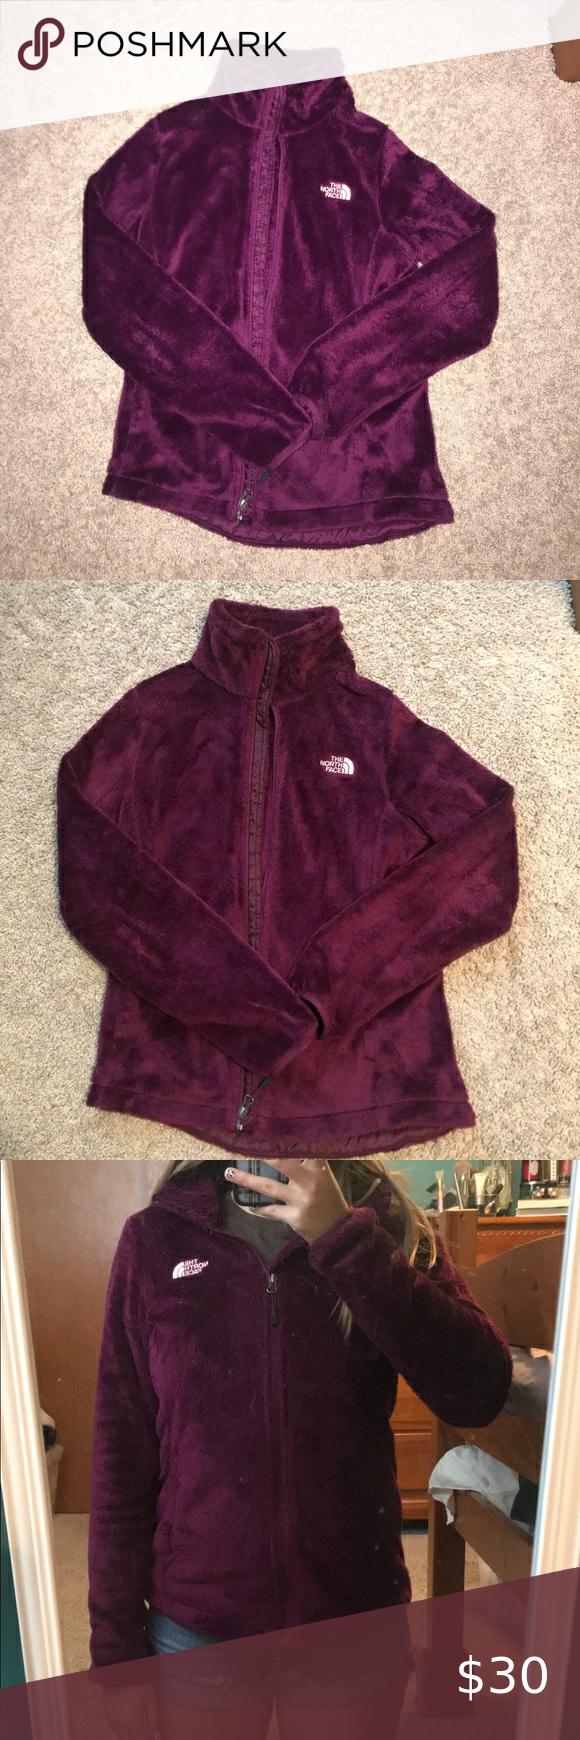 North Face Purple Fleece Jacket In 2020 Fleece Jacket The North Face Jackets [ 1740 x 580 Pixel ]